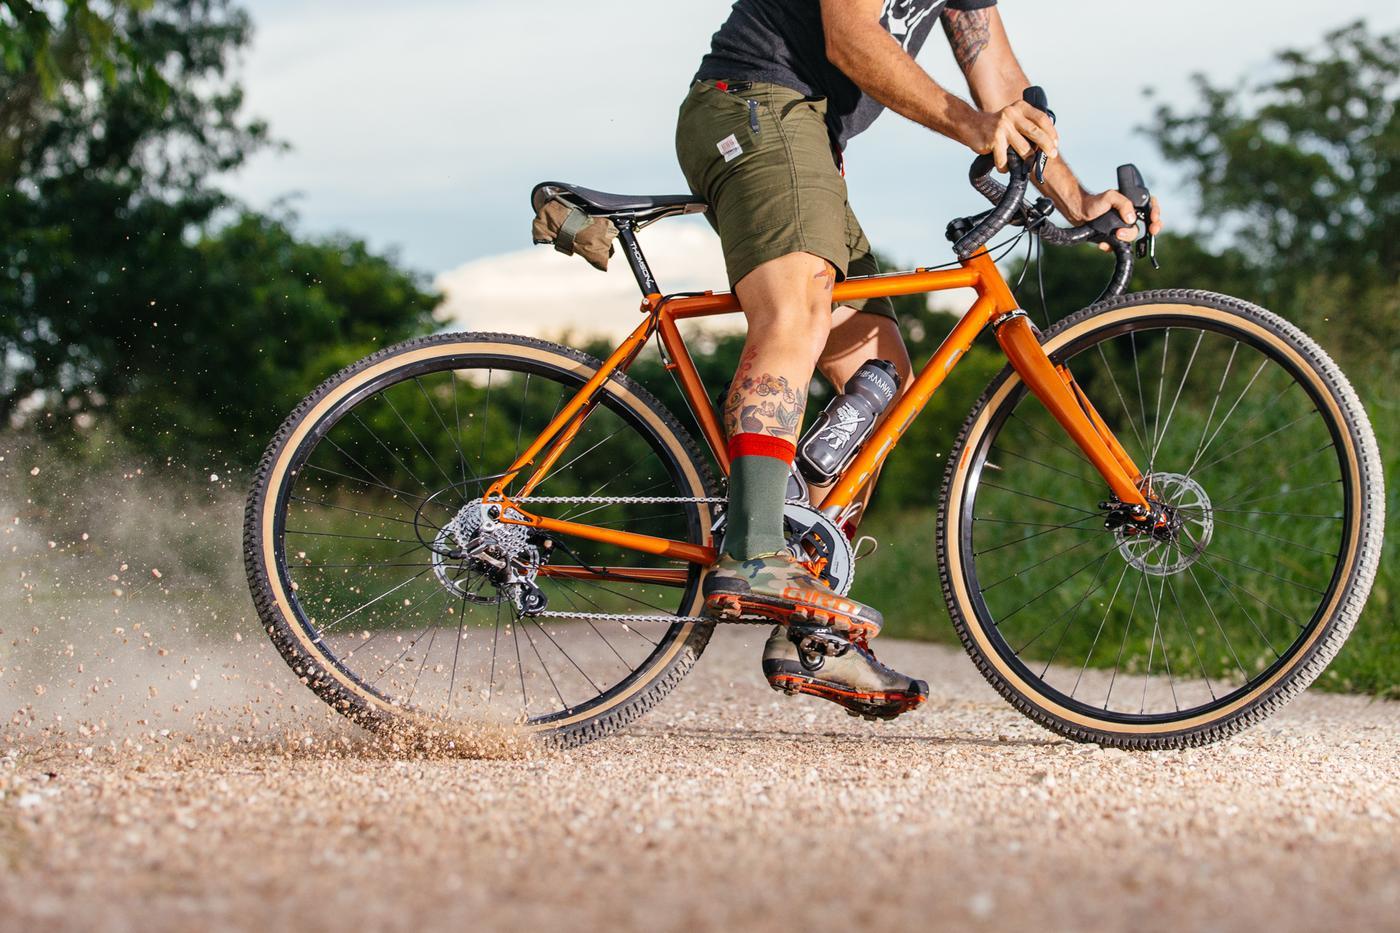 Get Sick New Bike Day